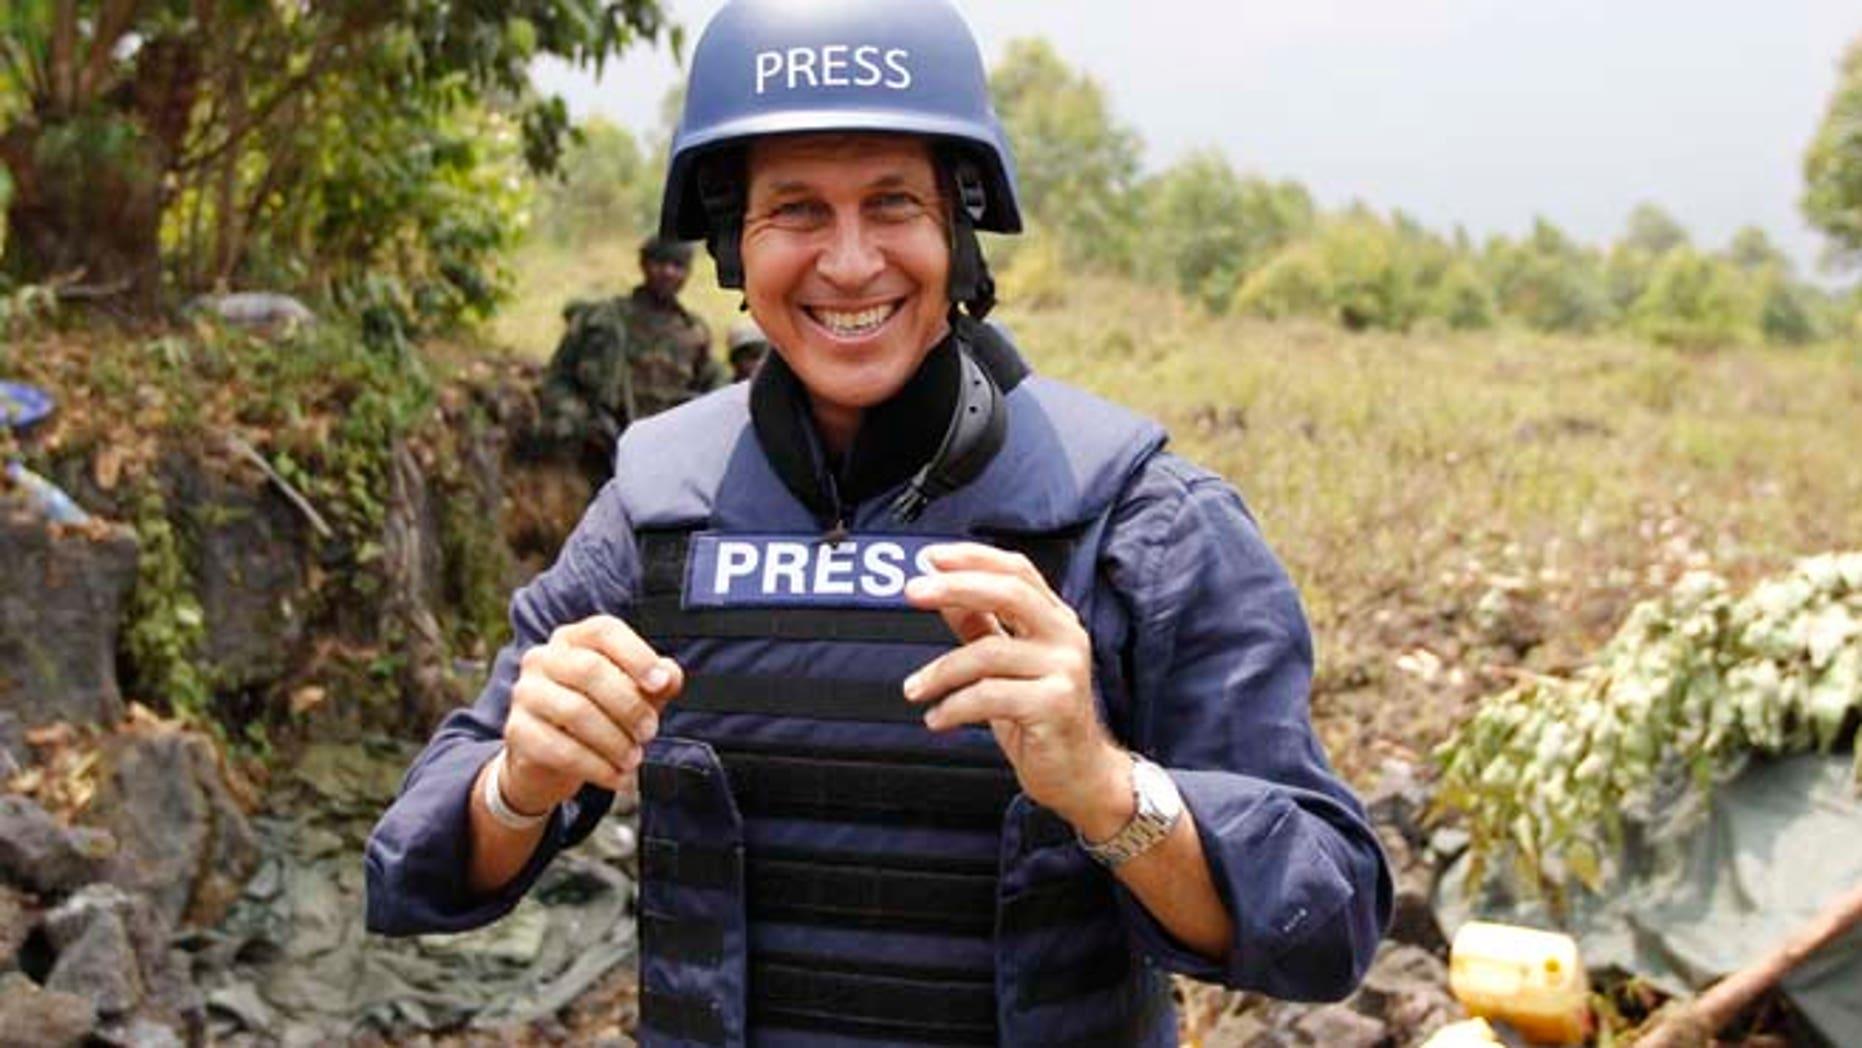 Aug. 7, 2013: Al Jazeera journalist Peter Greste poses for a photograph in Kibati village, near Goma in the eastern Democratic Republic of Congo. (Reuters)